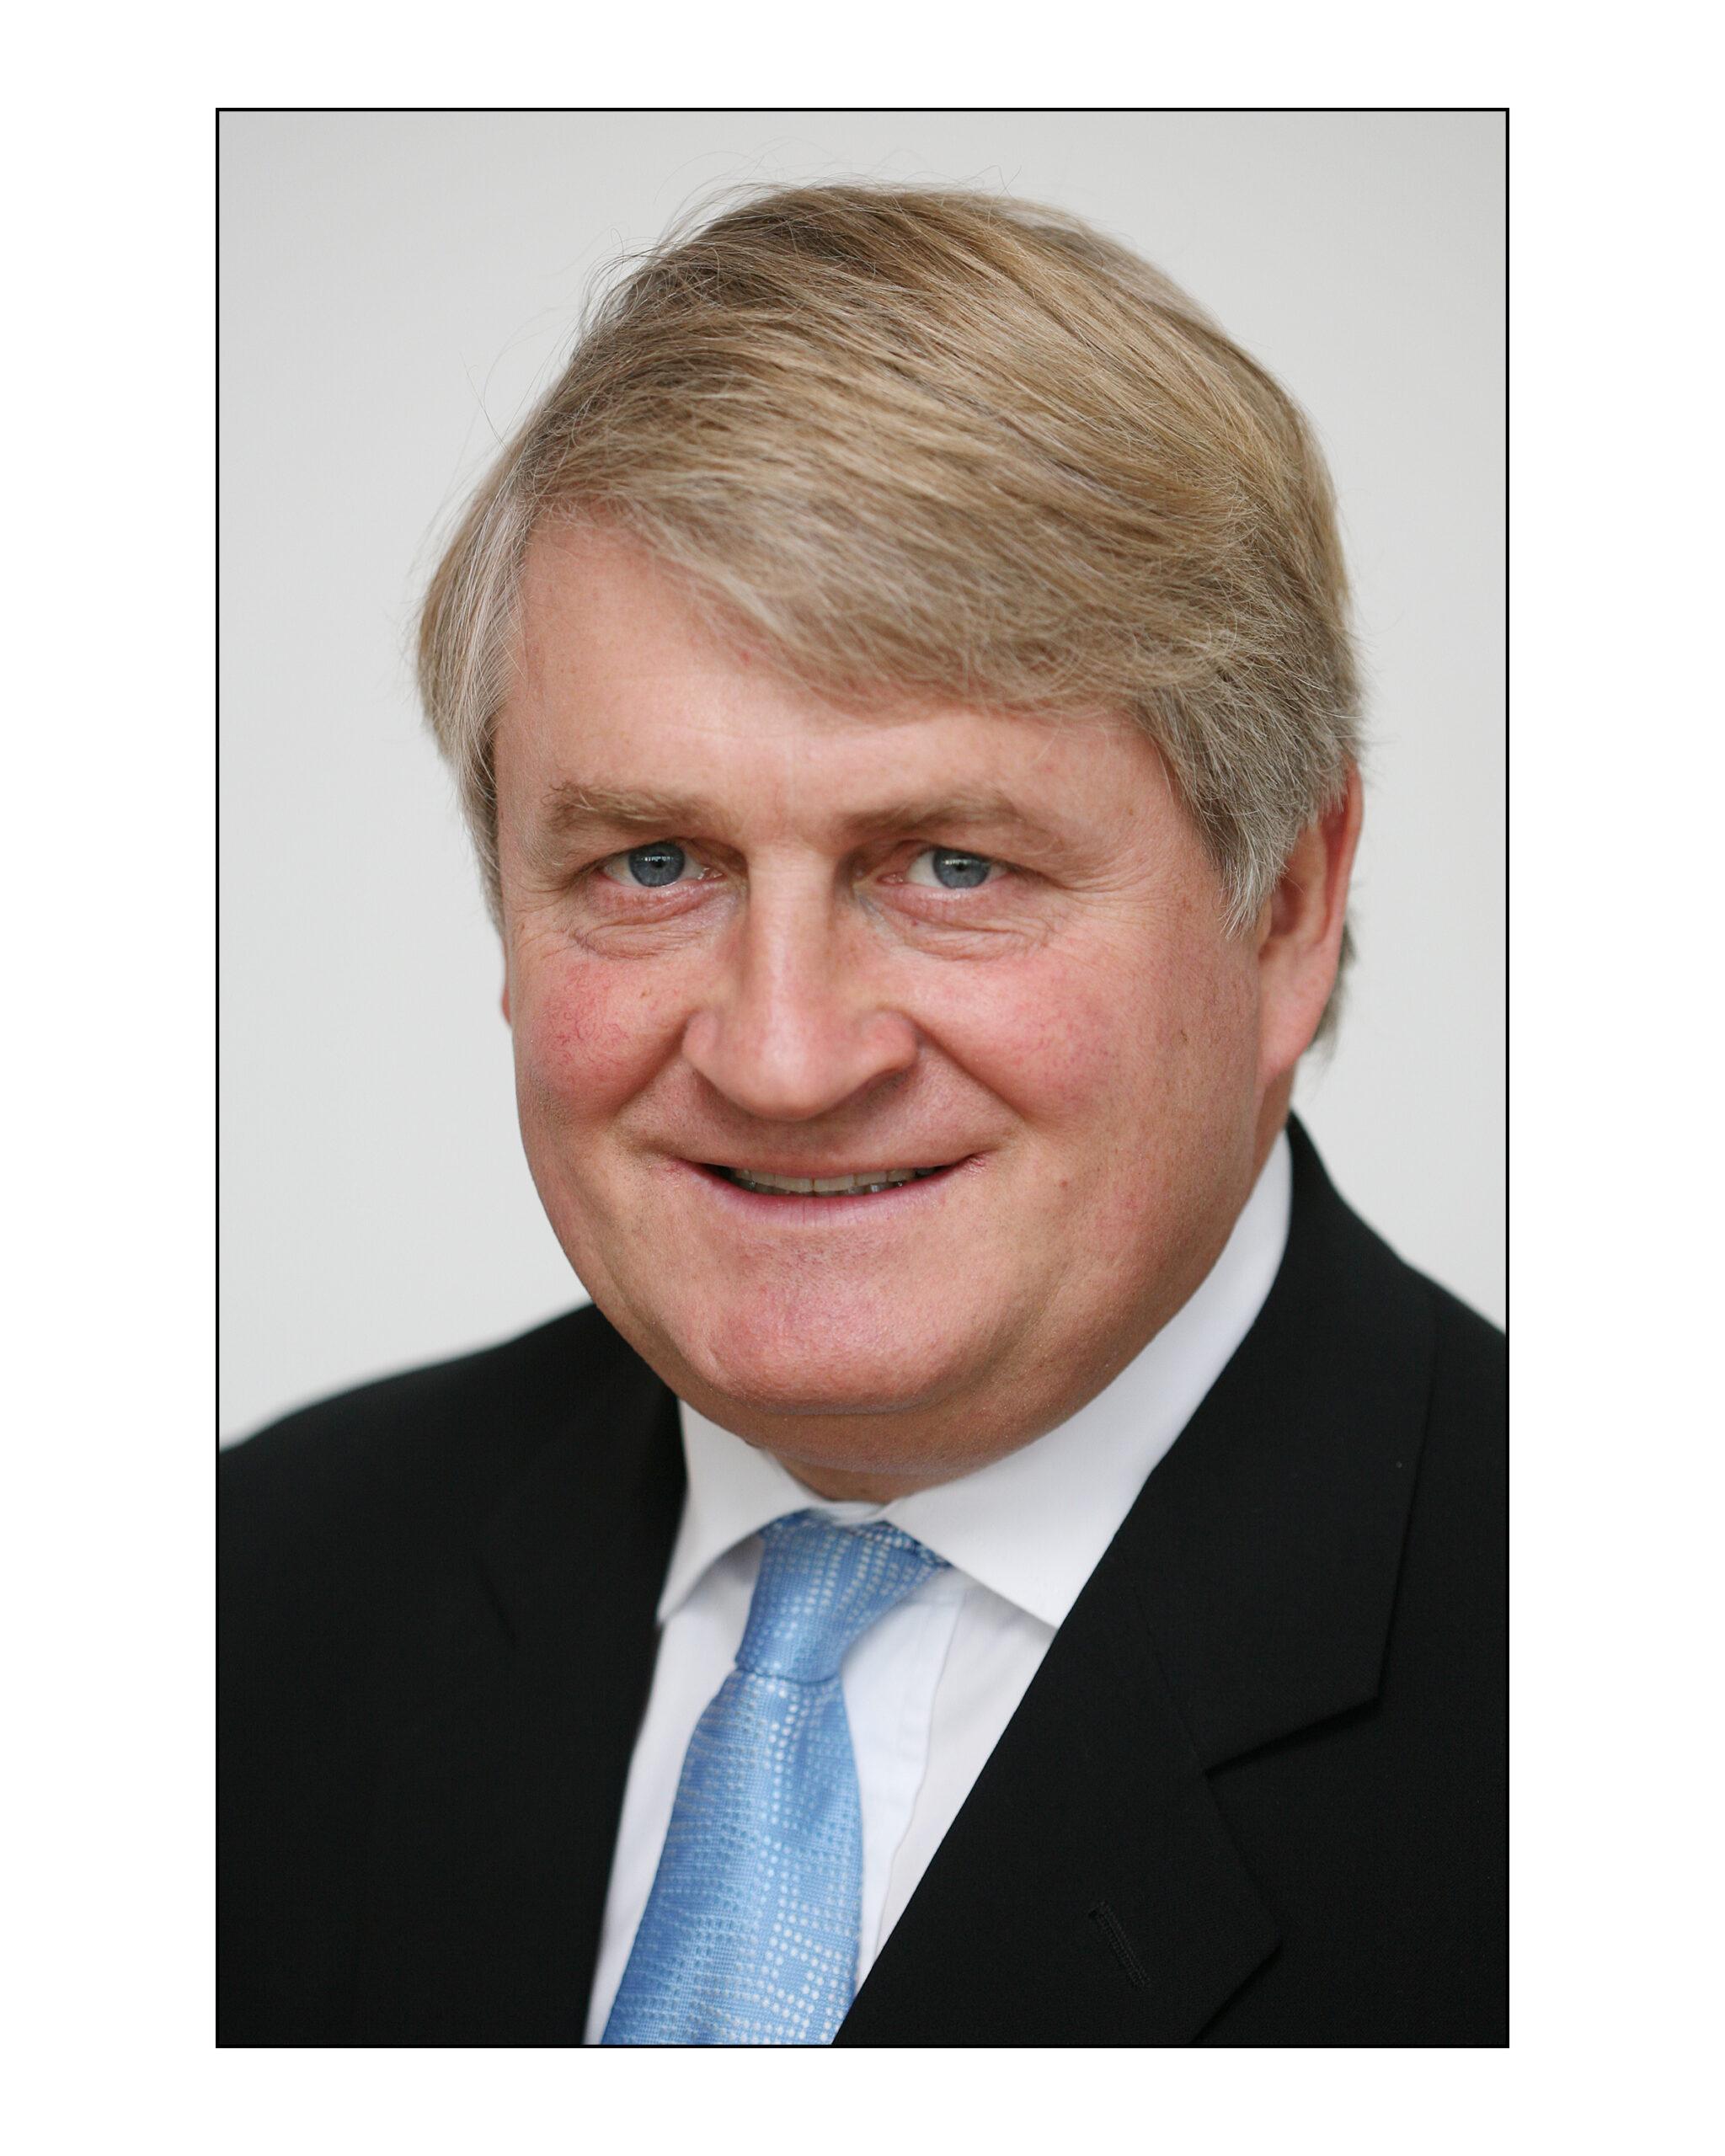 10/16/2020 - Chamber Webinar with Guest Speaker Denis O'Brien